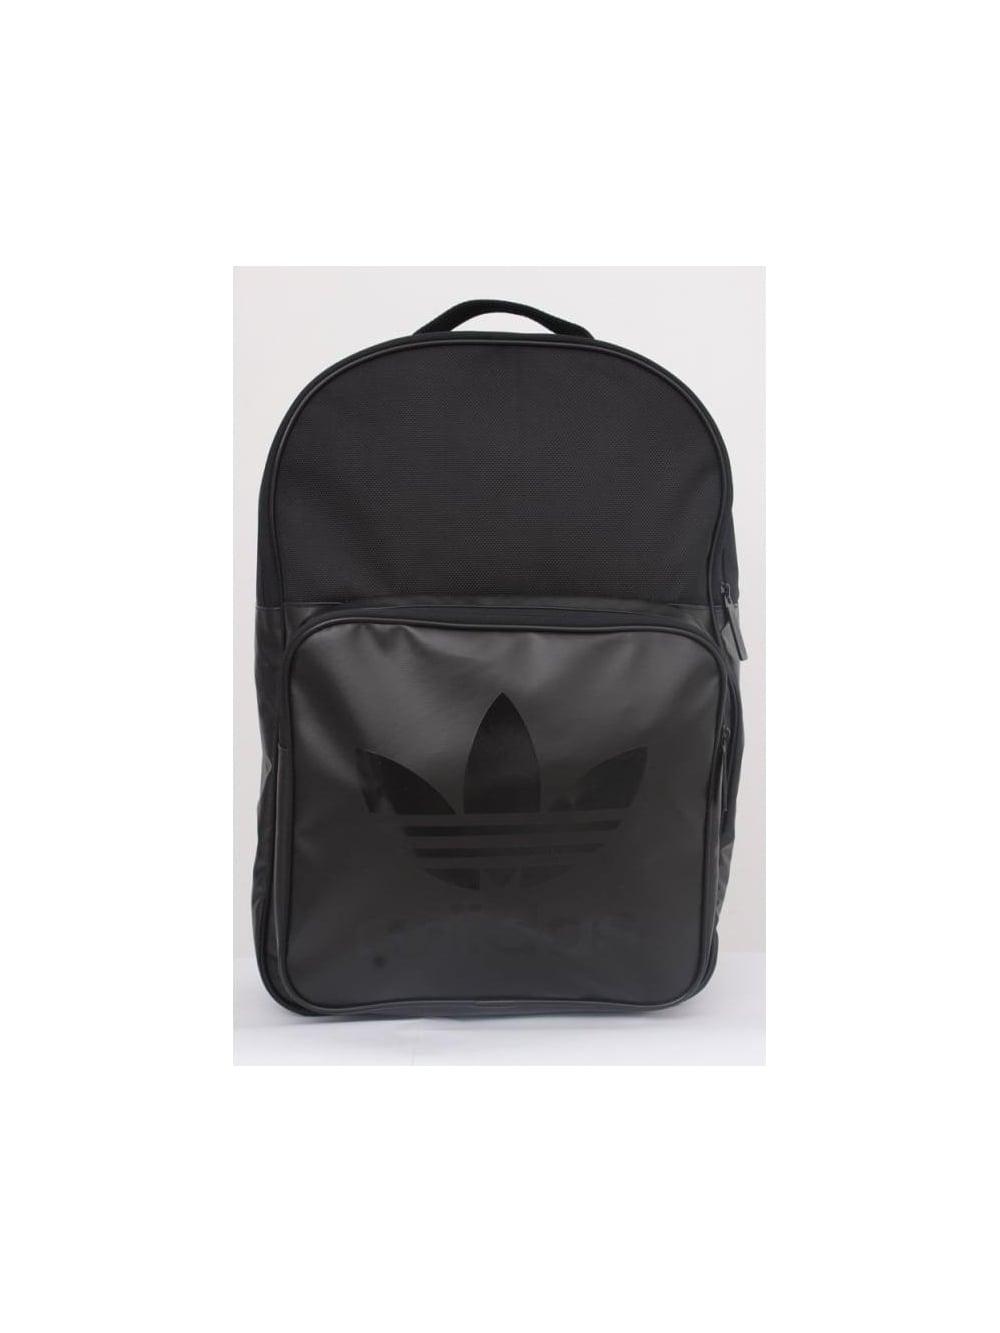 adidas Originals Classic Backpack in Black - Northern Threads ae6ddeb55b450